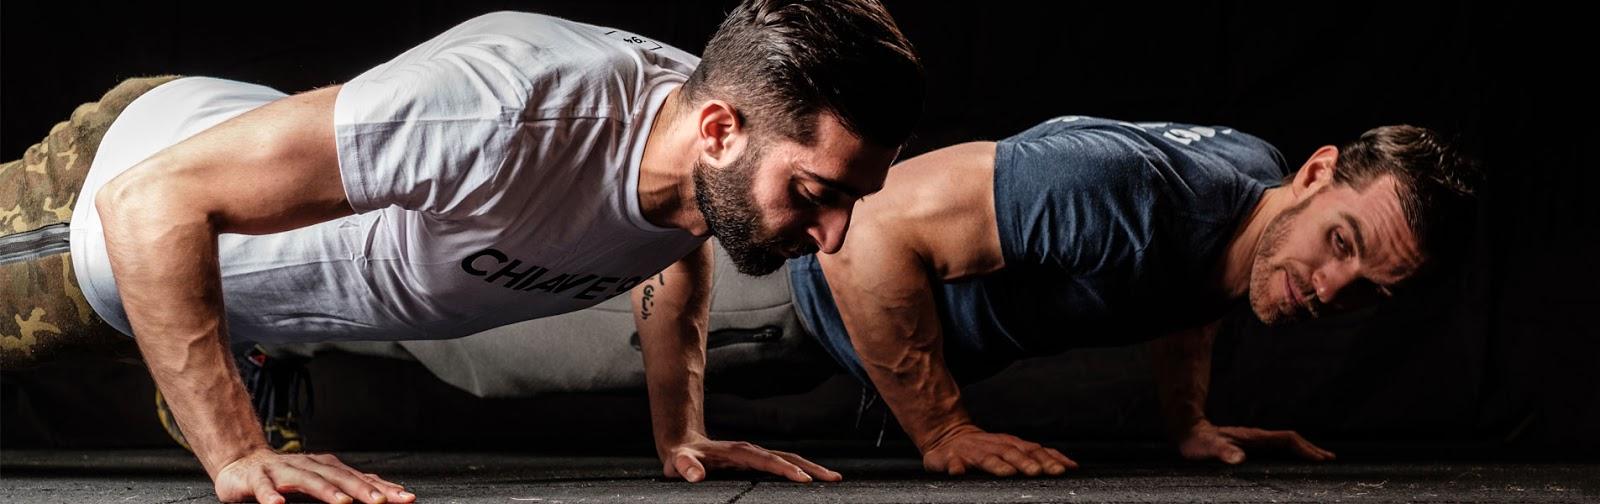 fitness nijmegen